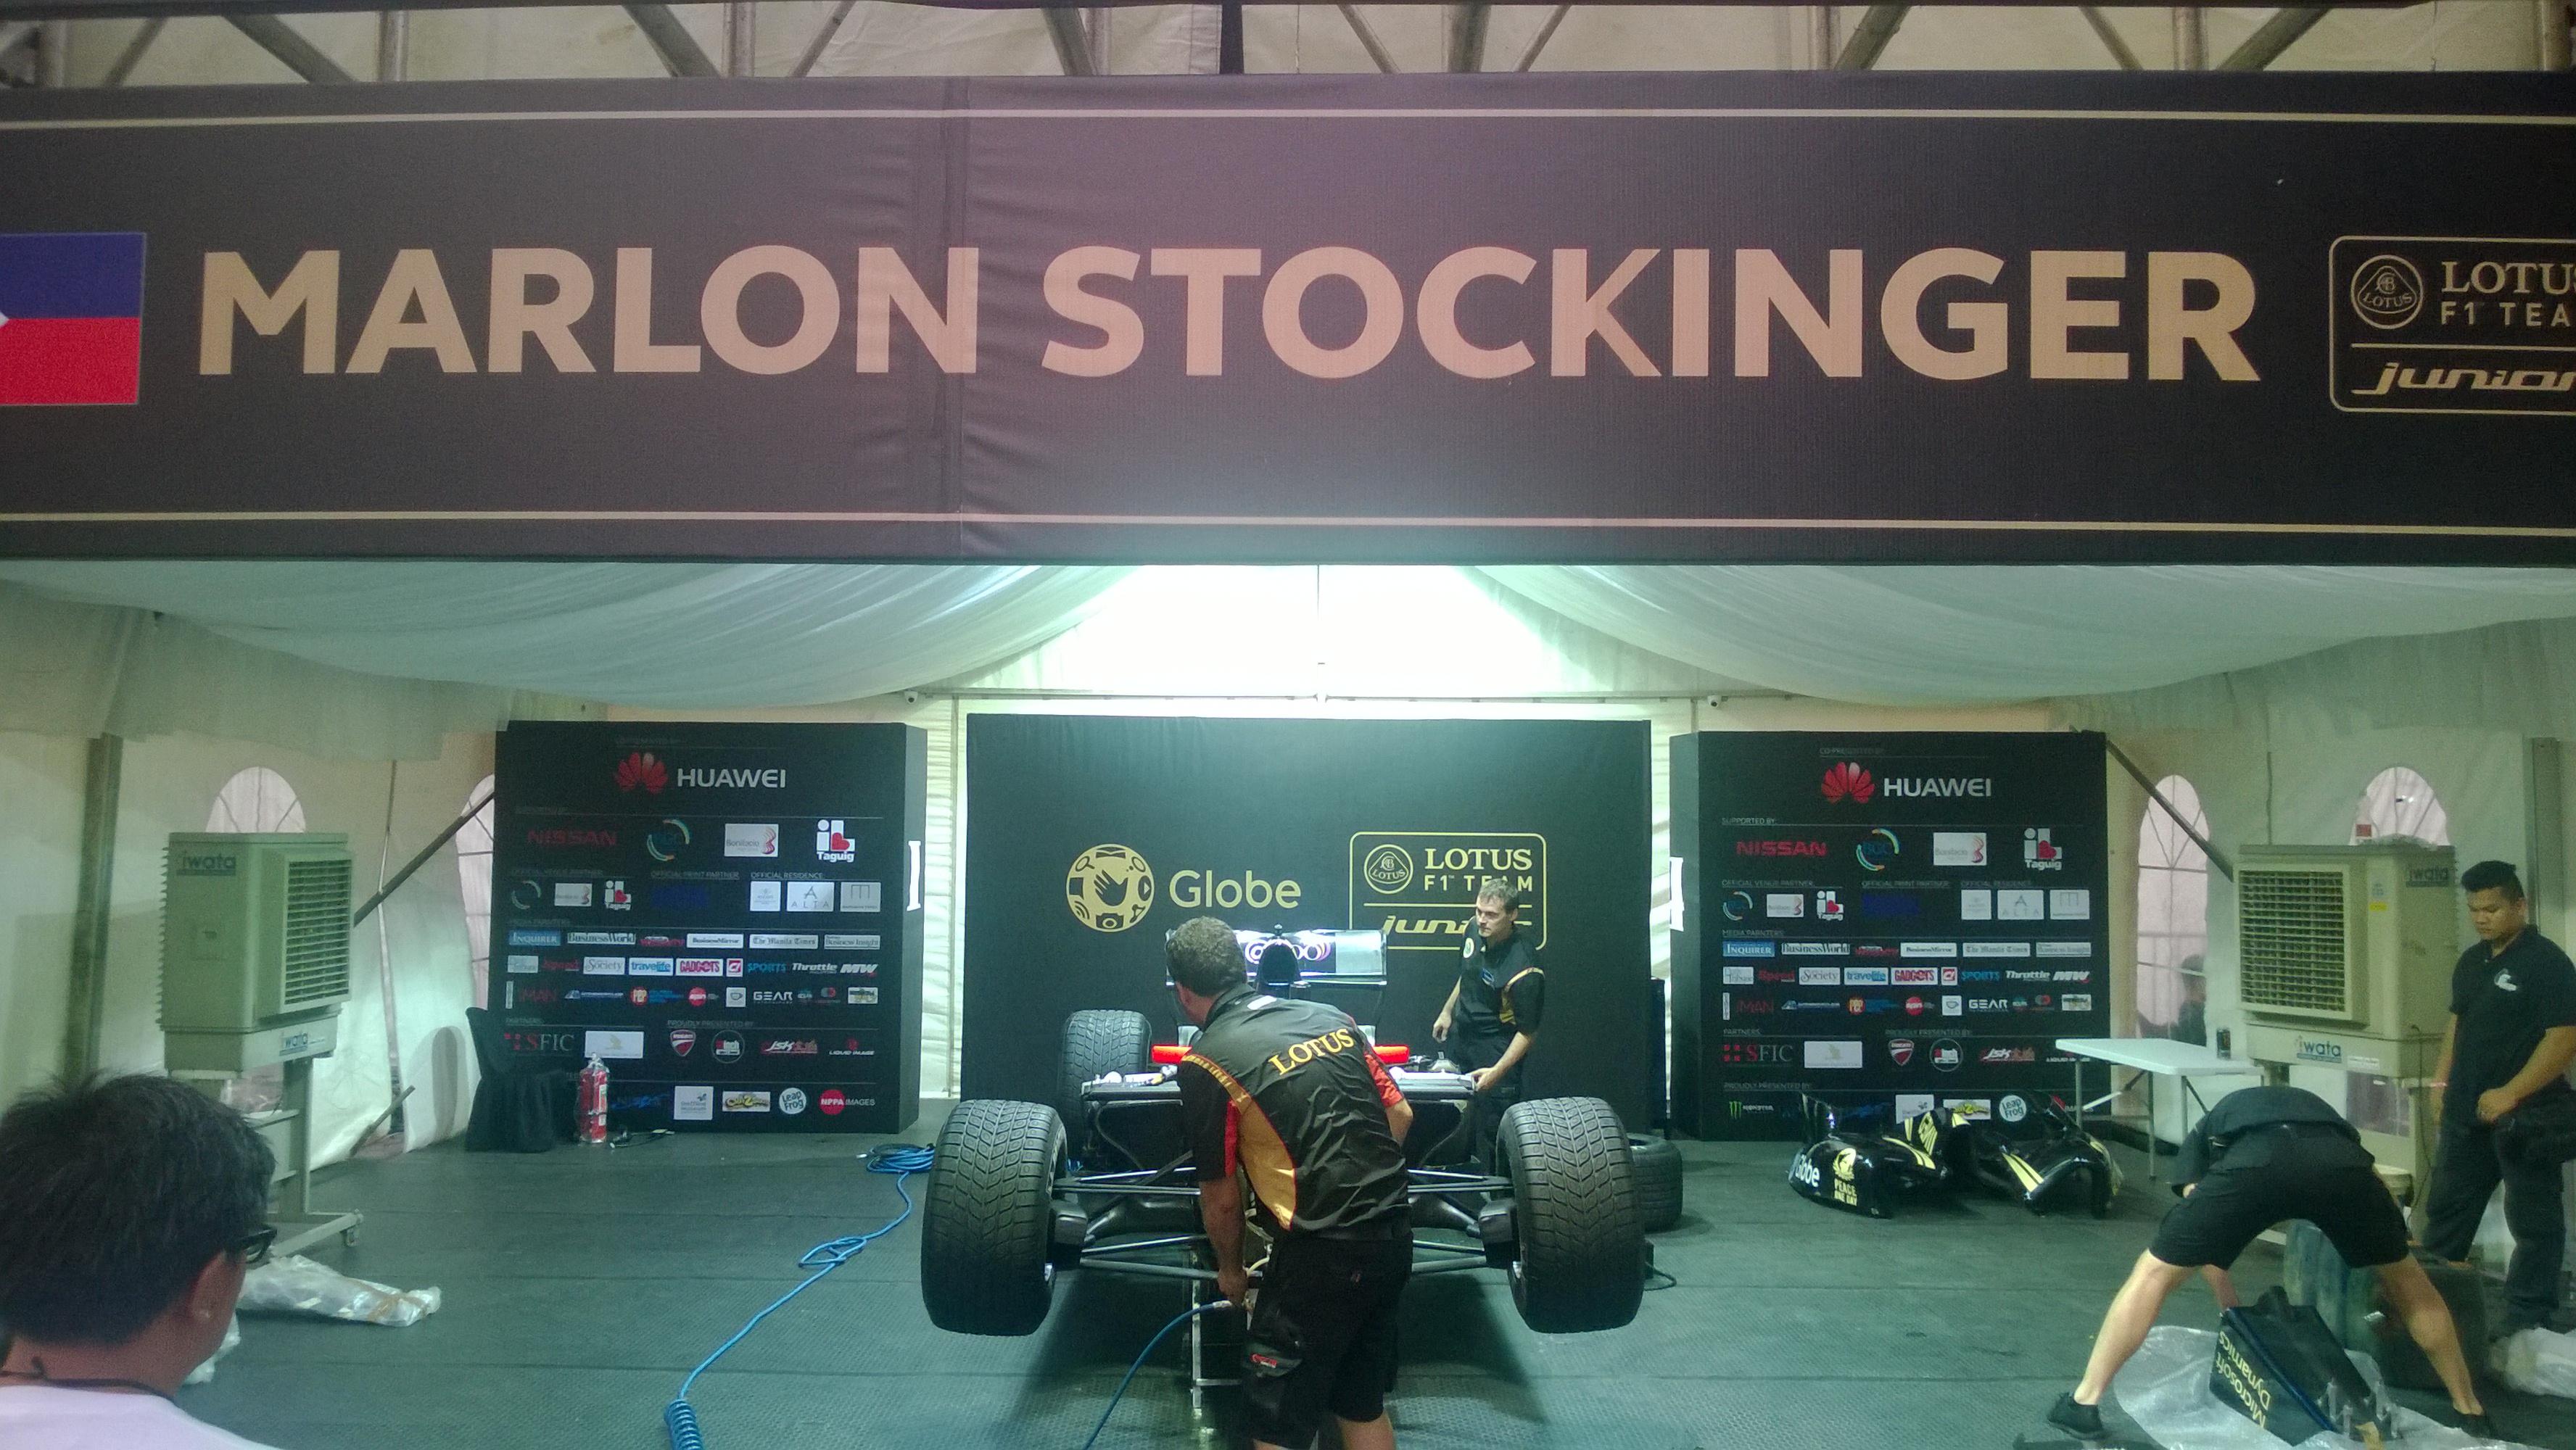 Globe Telecom Slip Stream Marlon Stockinger BGC Taguig Manila Philippines Duane Bacon Bilis Ng Pinoy Pit Stop